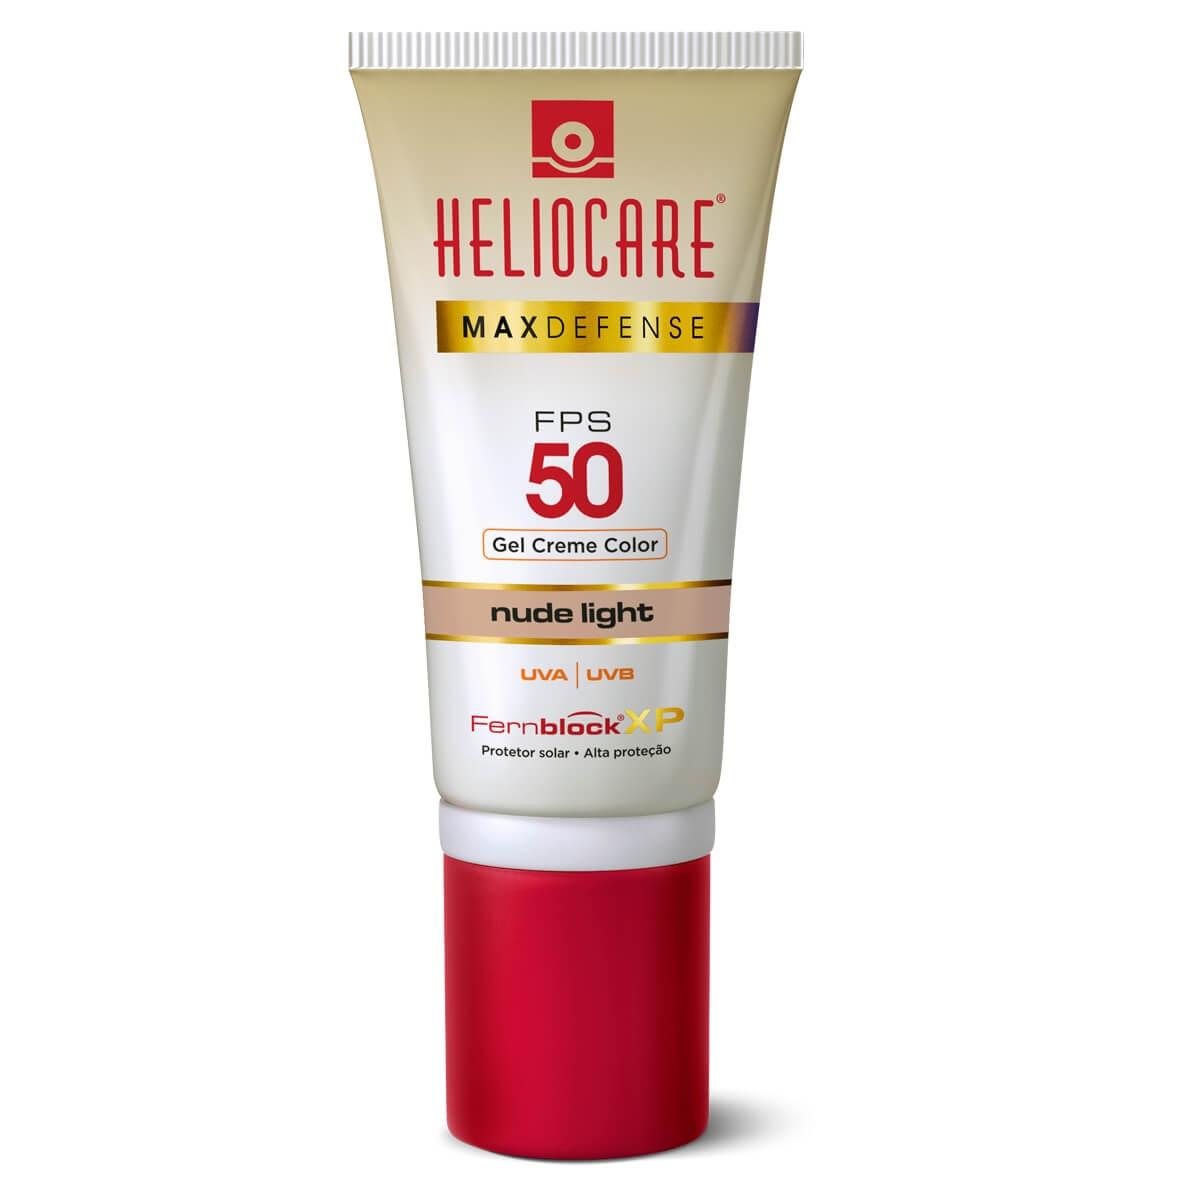 Protetor Solar Gel Creme Color Heliocare Max Defense Nude Light FPS50 50g